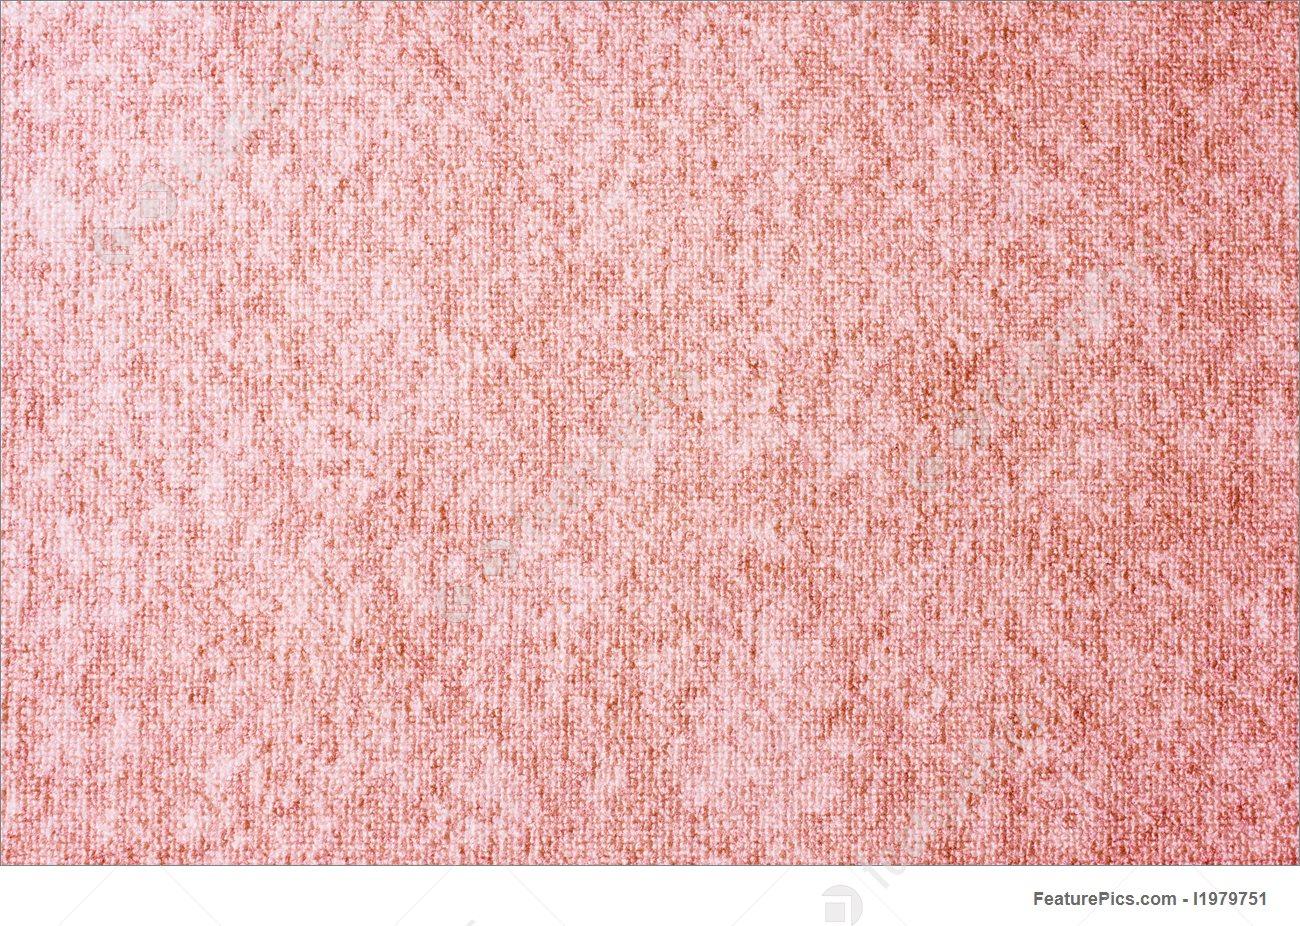 Texture Christmas Pink Textile Background   Stock Photo I1979751 1300x926